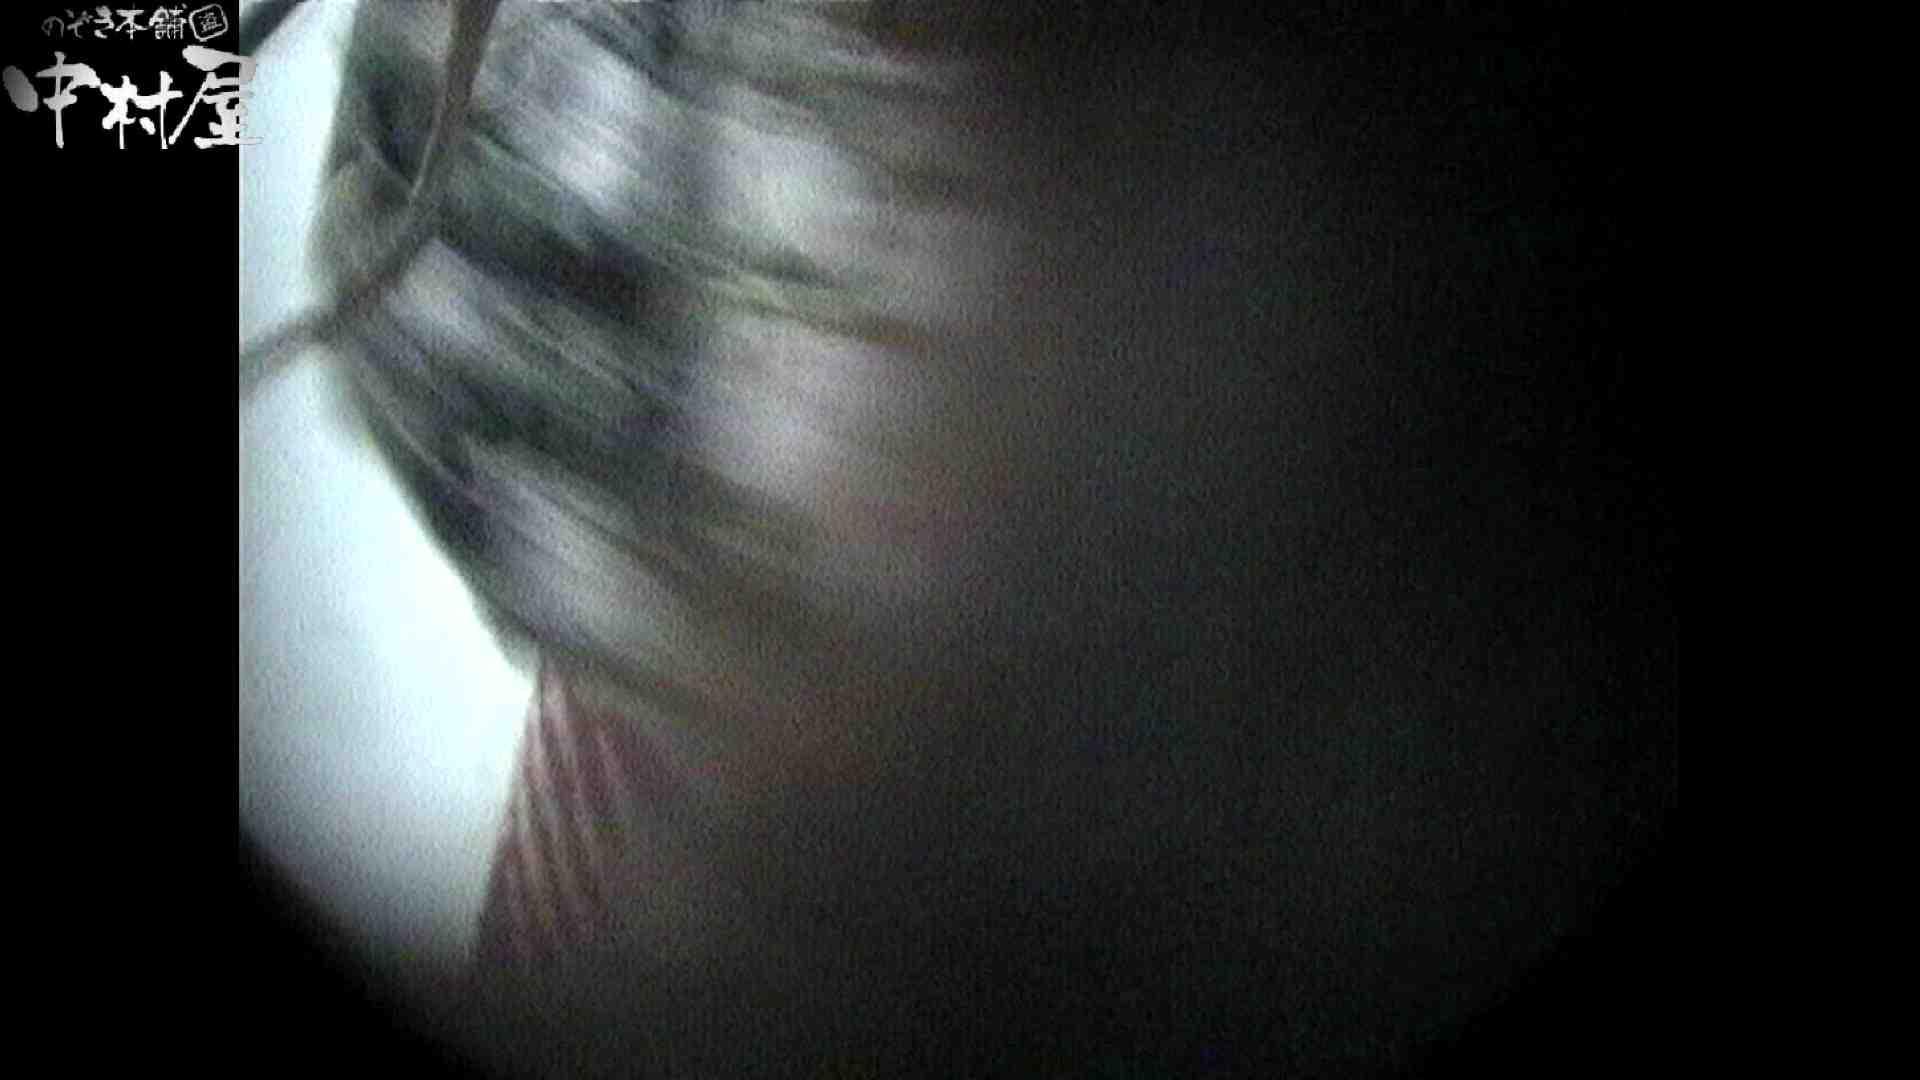 No.46 マシュマロ巨乳が目の前でプルプル 0  78連発 4